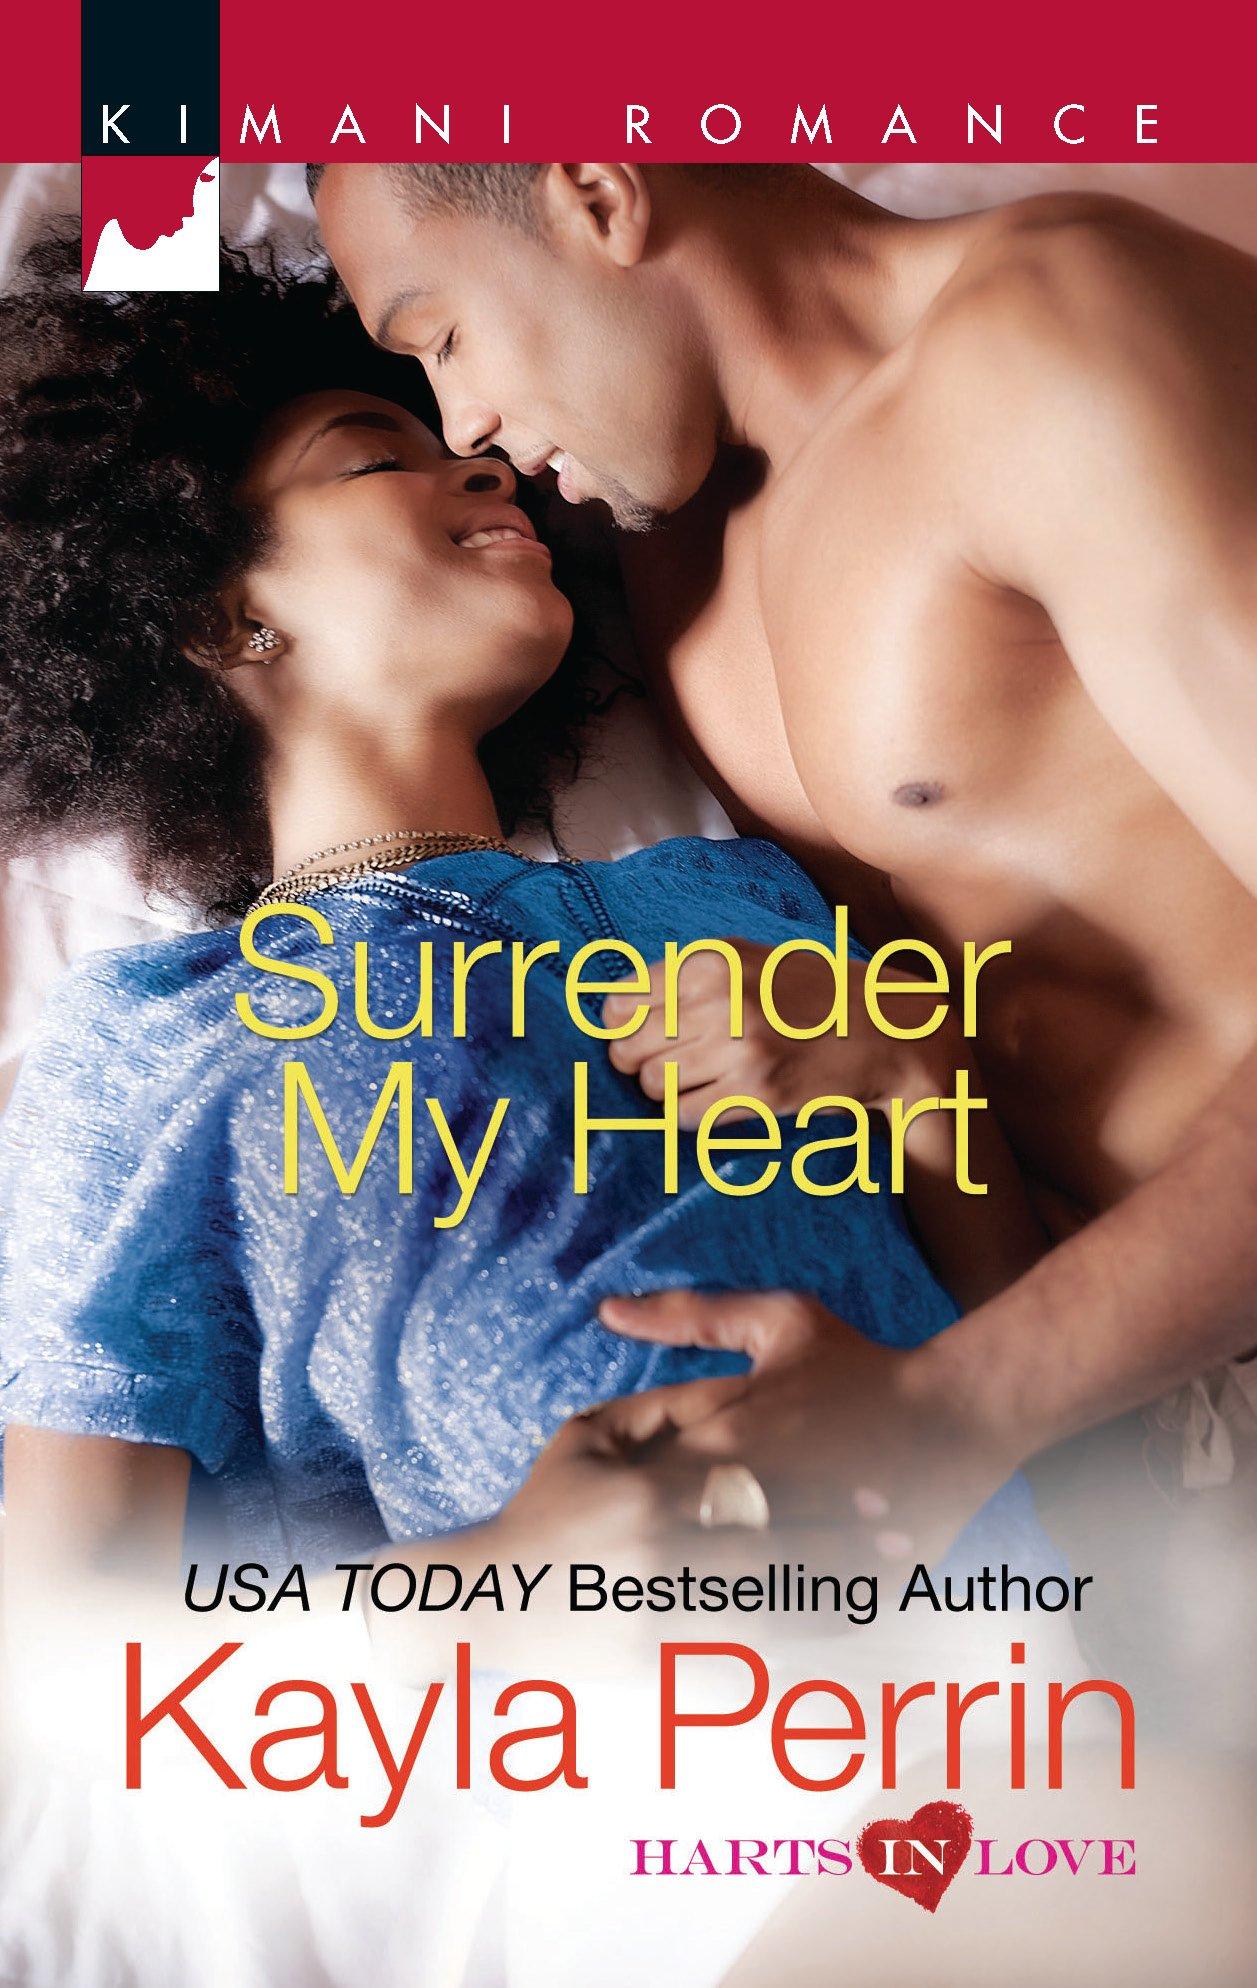 Amazon.com: Surrender My Heart (Harts in Love) (9780373862603): Kayla  Perrin: Books